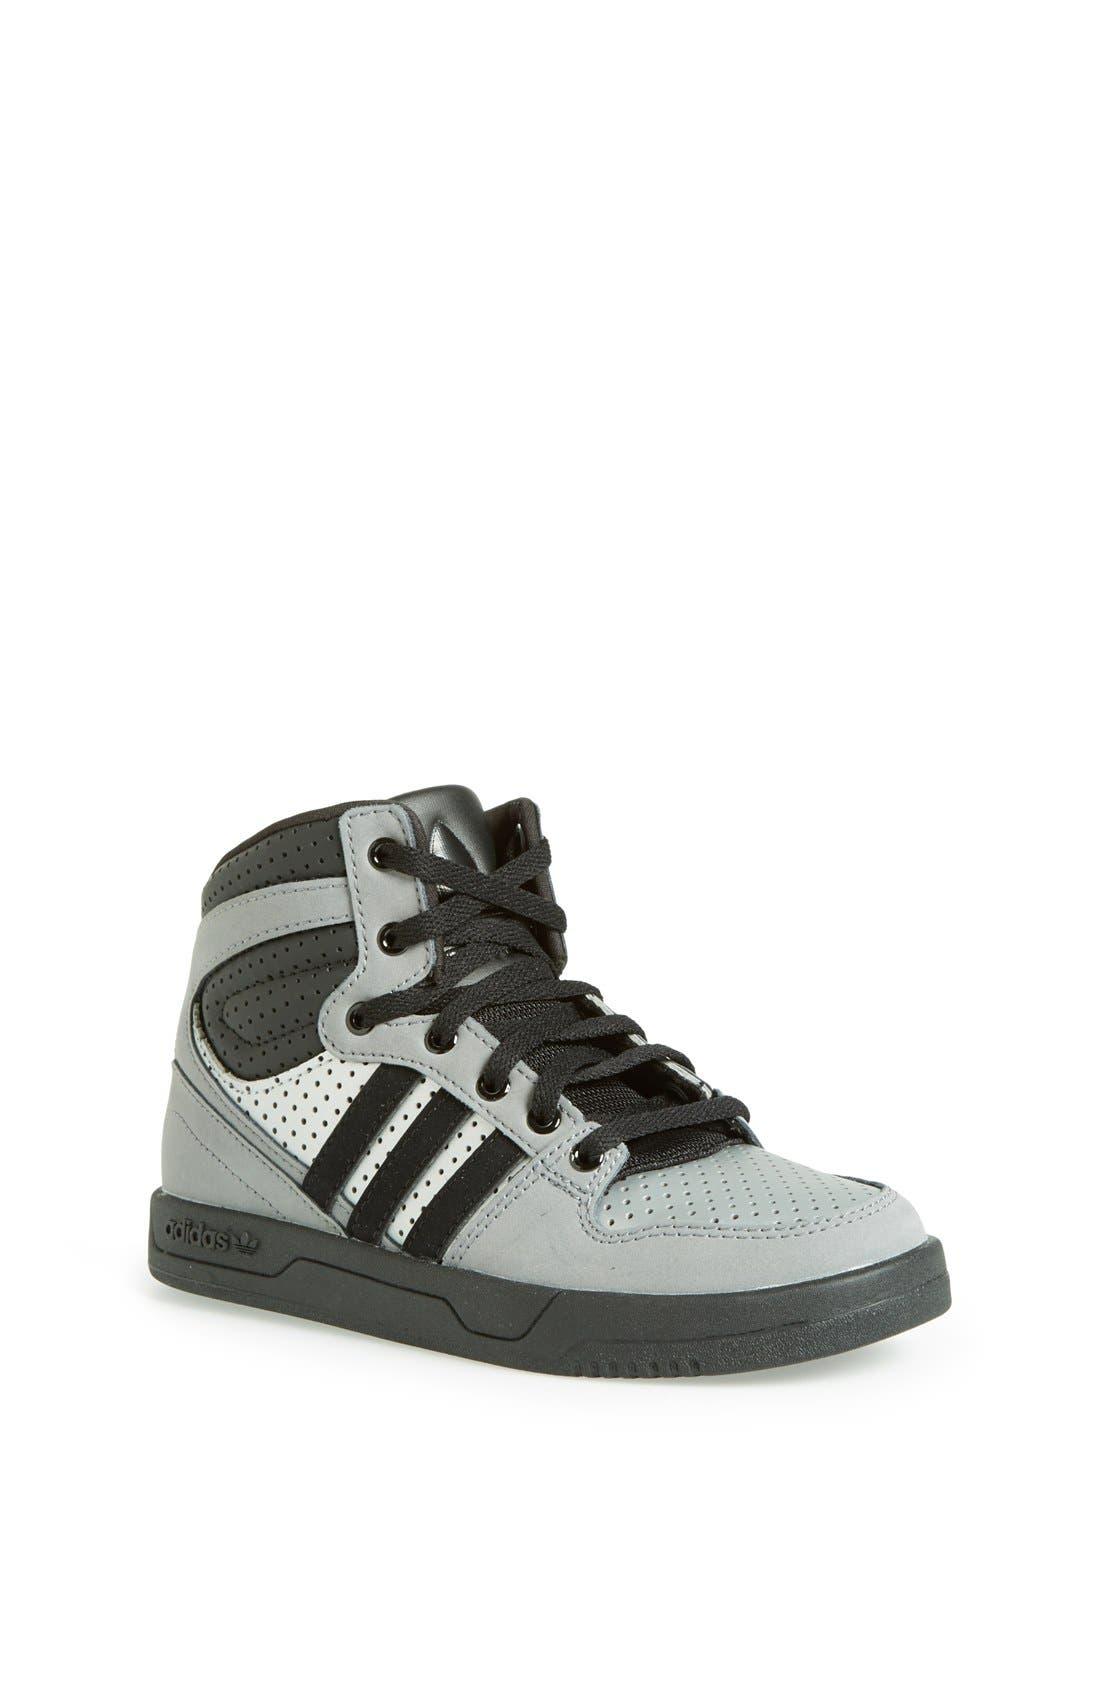 Main Image - adidas 'Court Attitude' Sneaker (Toddler, Little Kid & Big Kid)